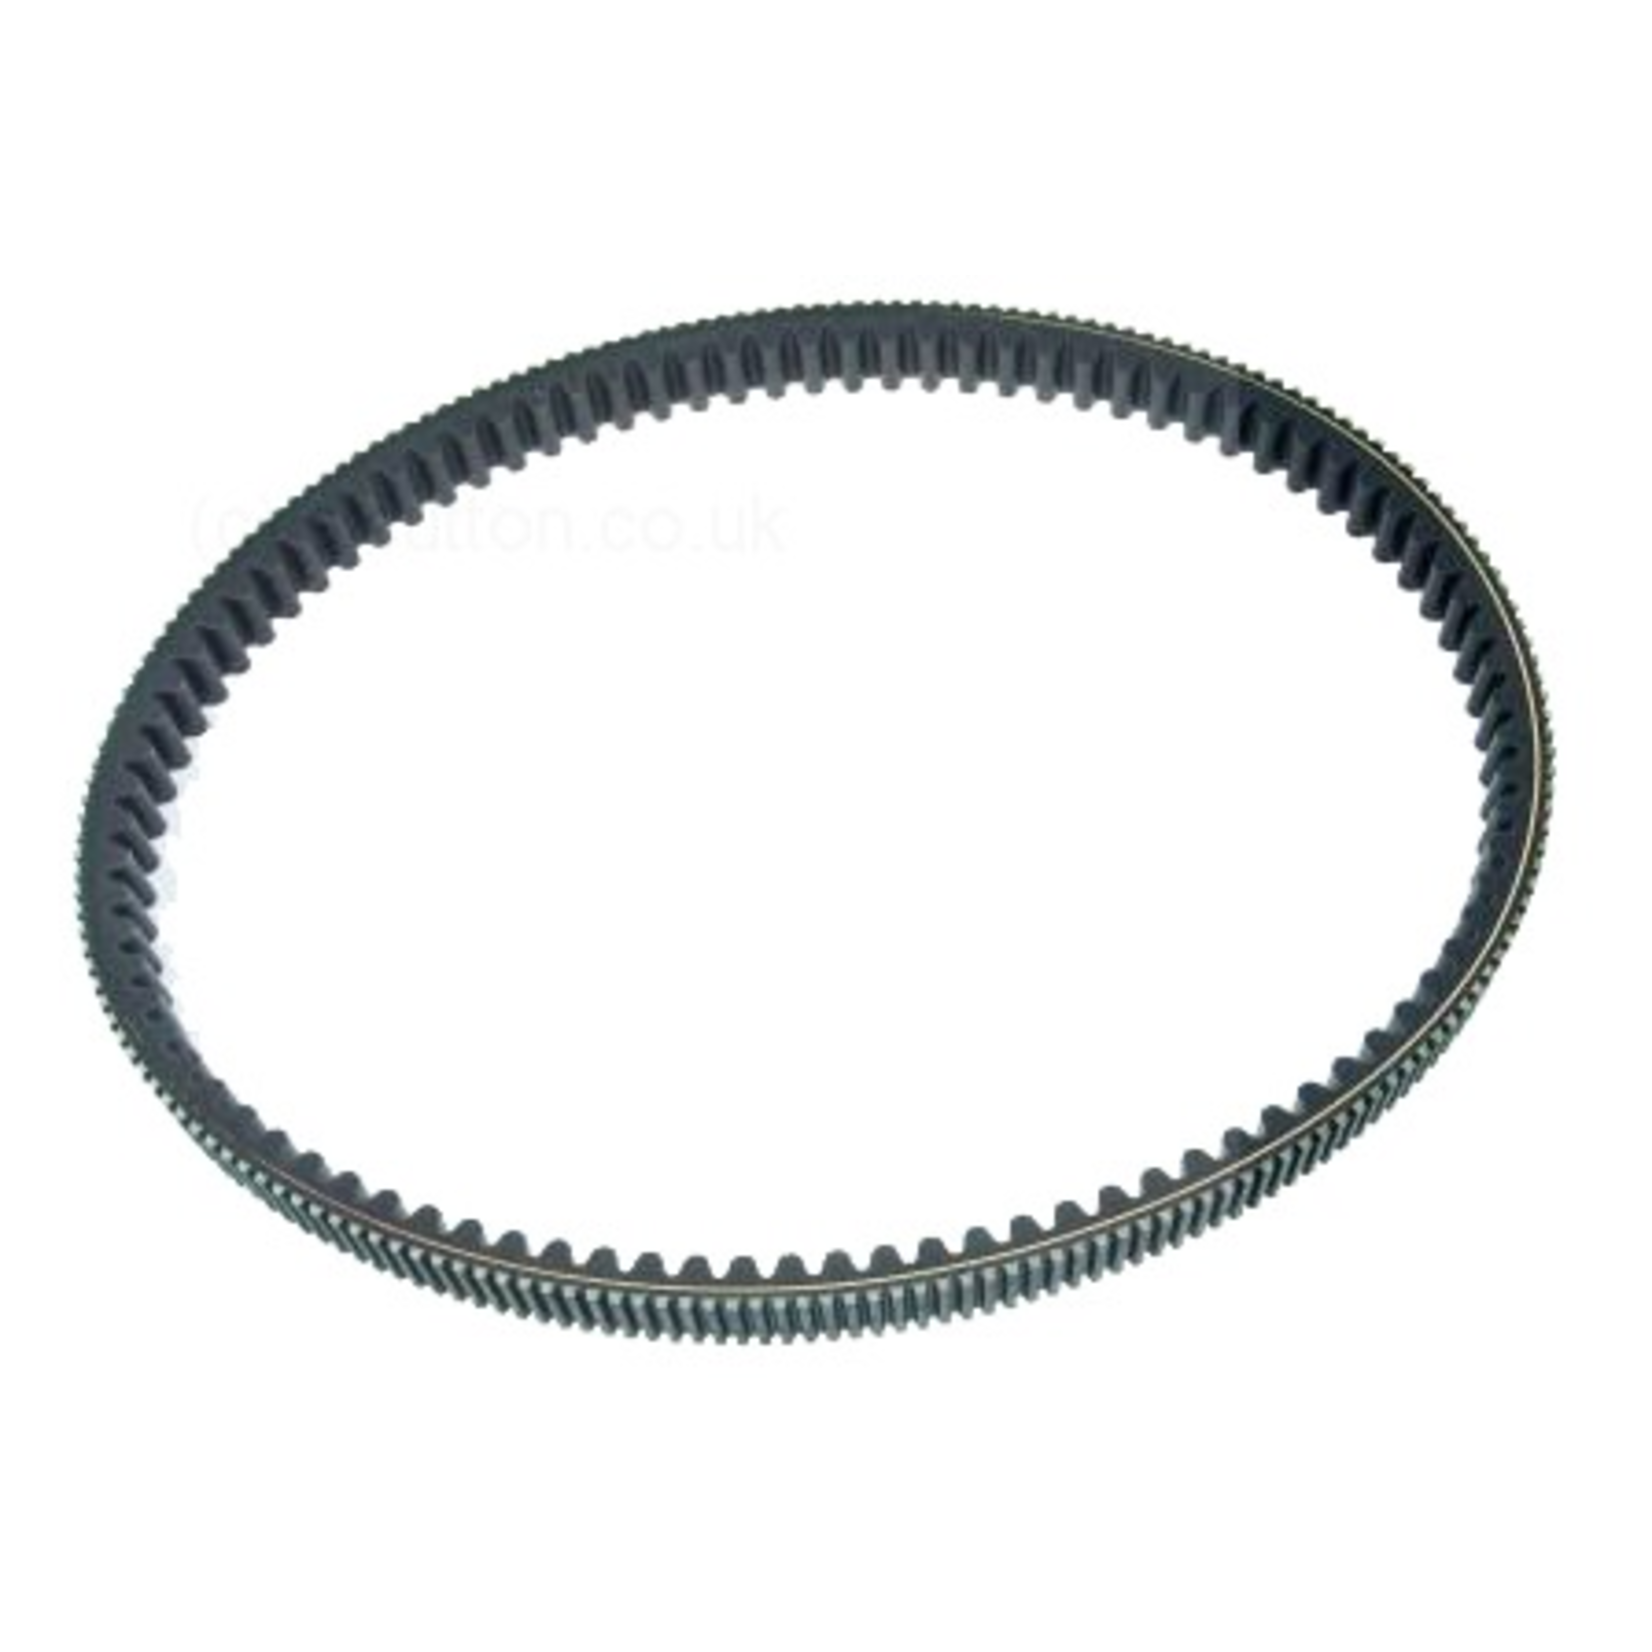 Parts Belt, Transmission MP3-400 X9 BV500 Scarabeo500